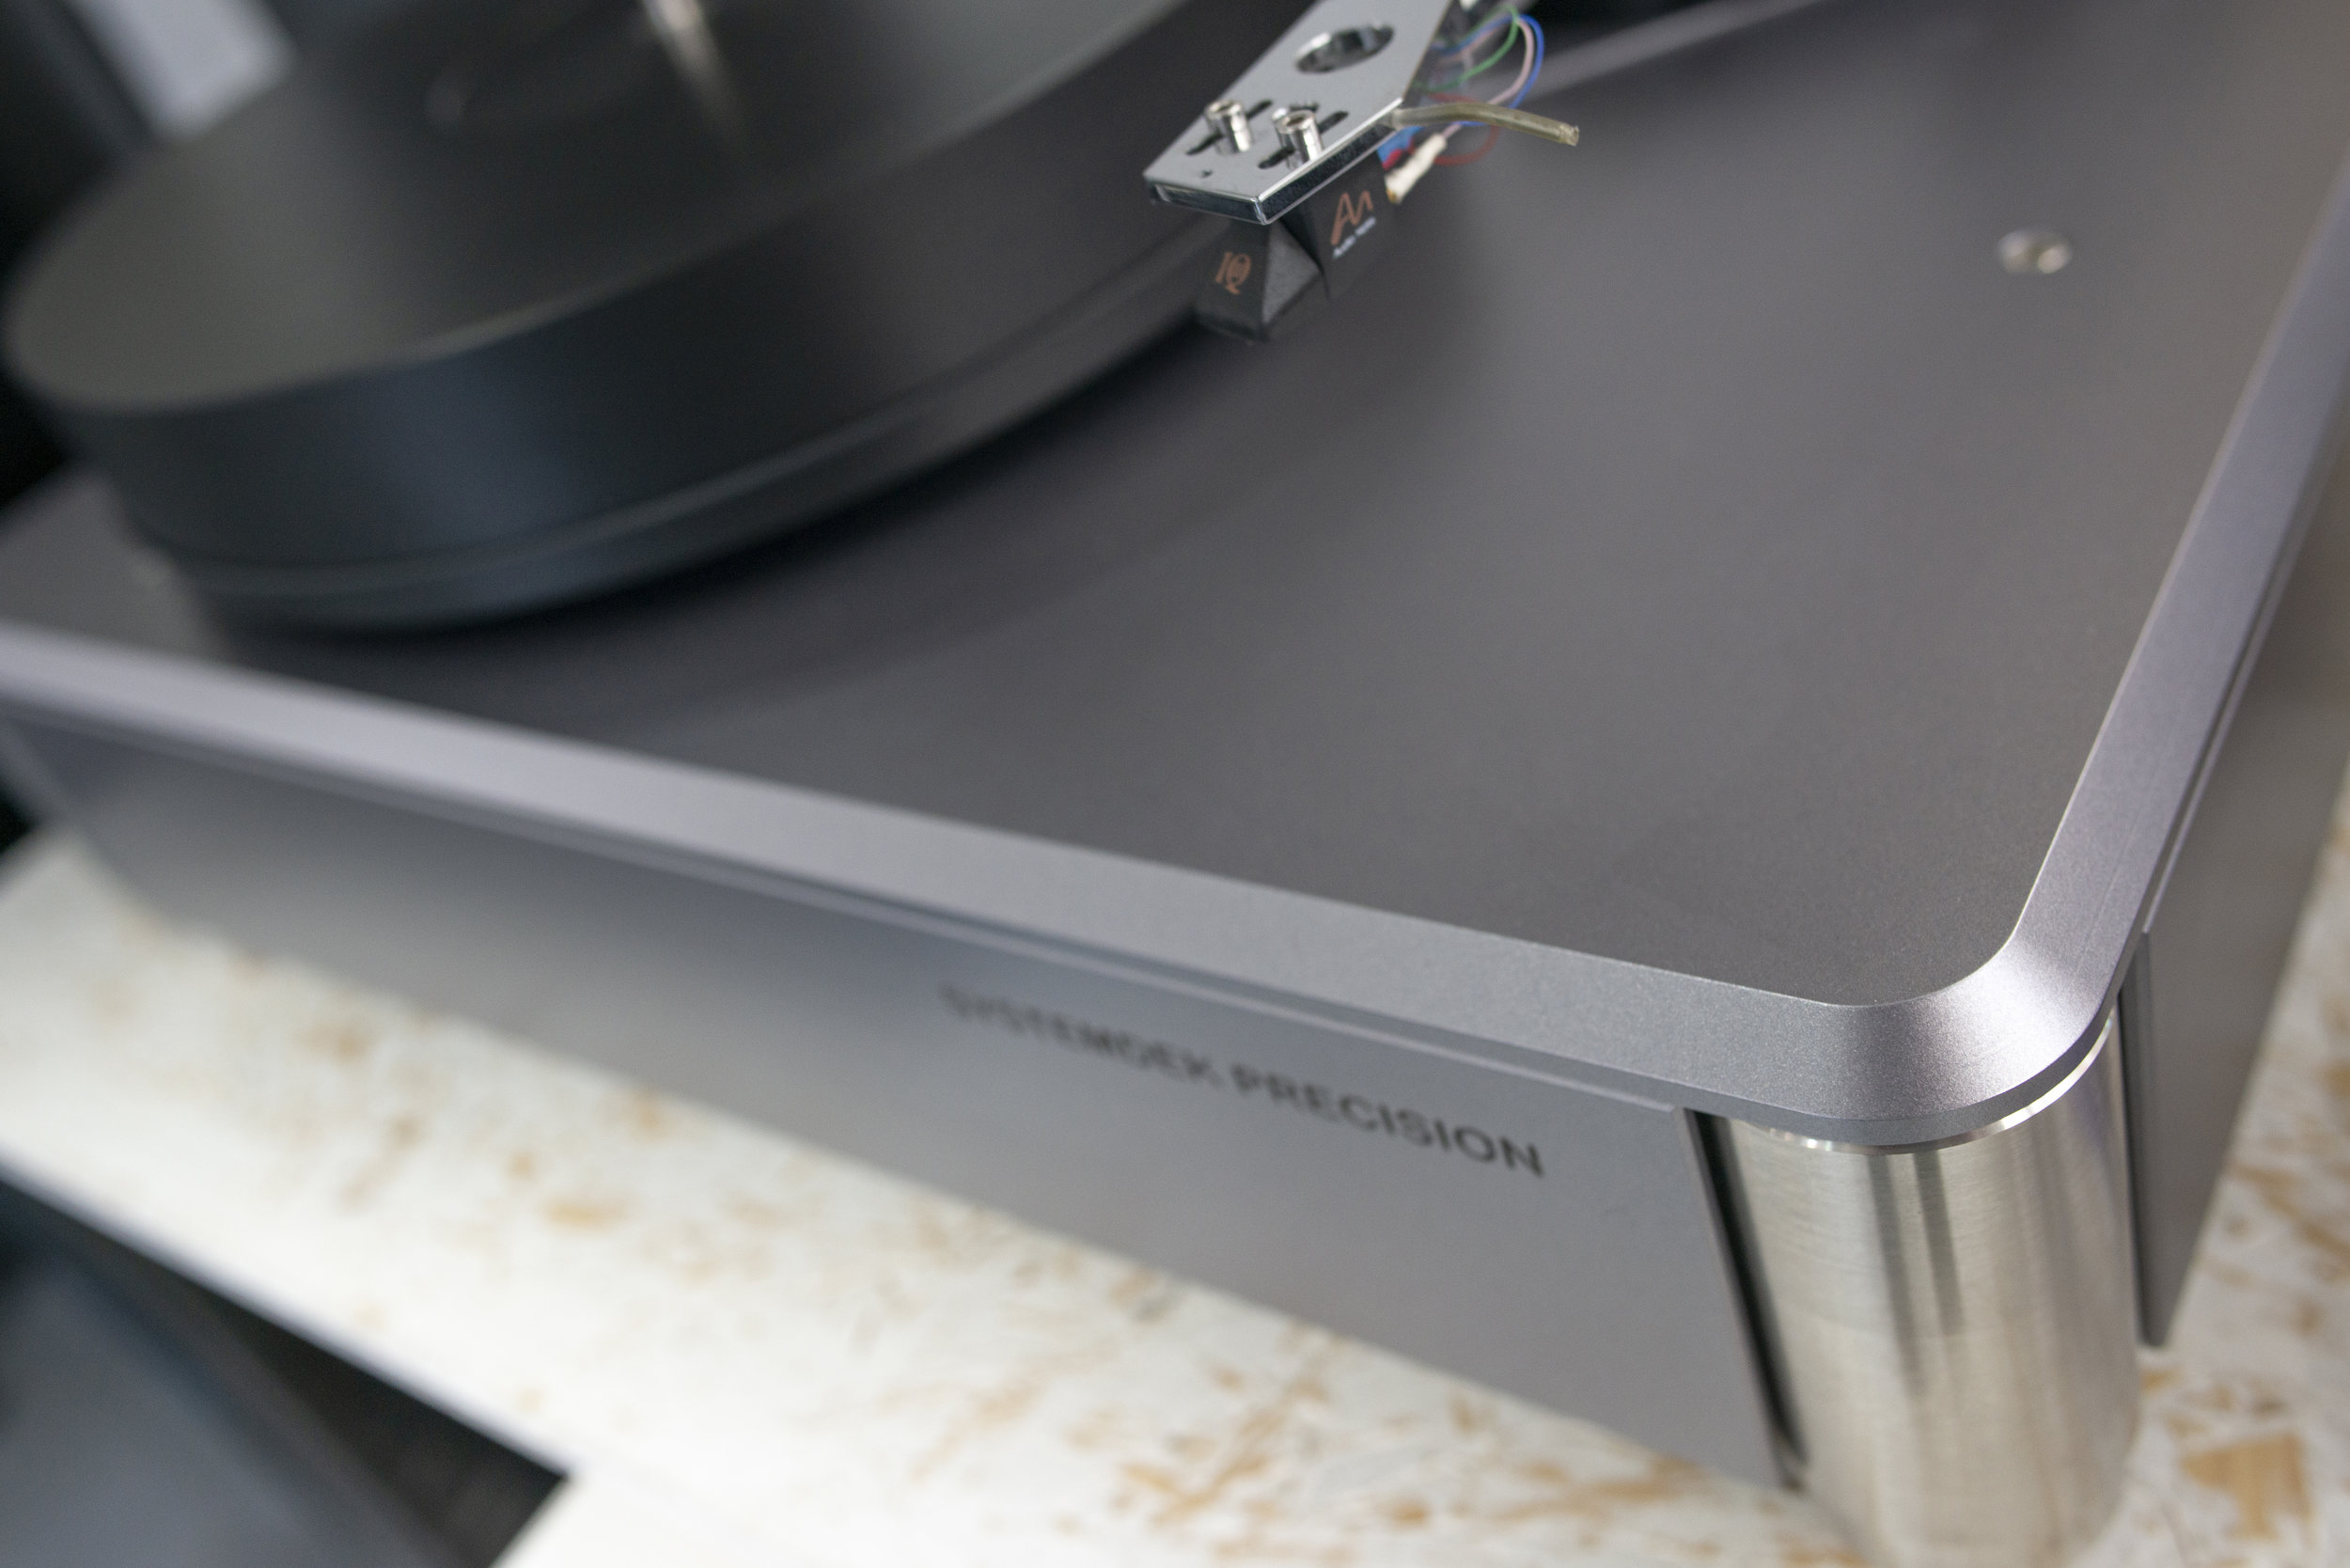 Systemdek at Audiophilia Retailer, Scotland